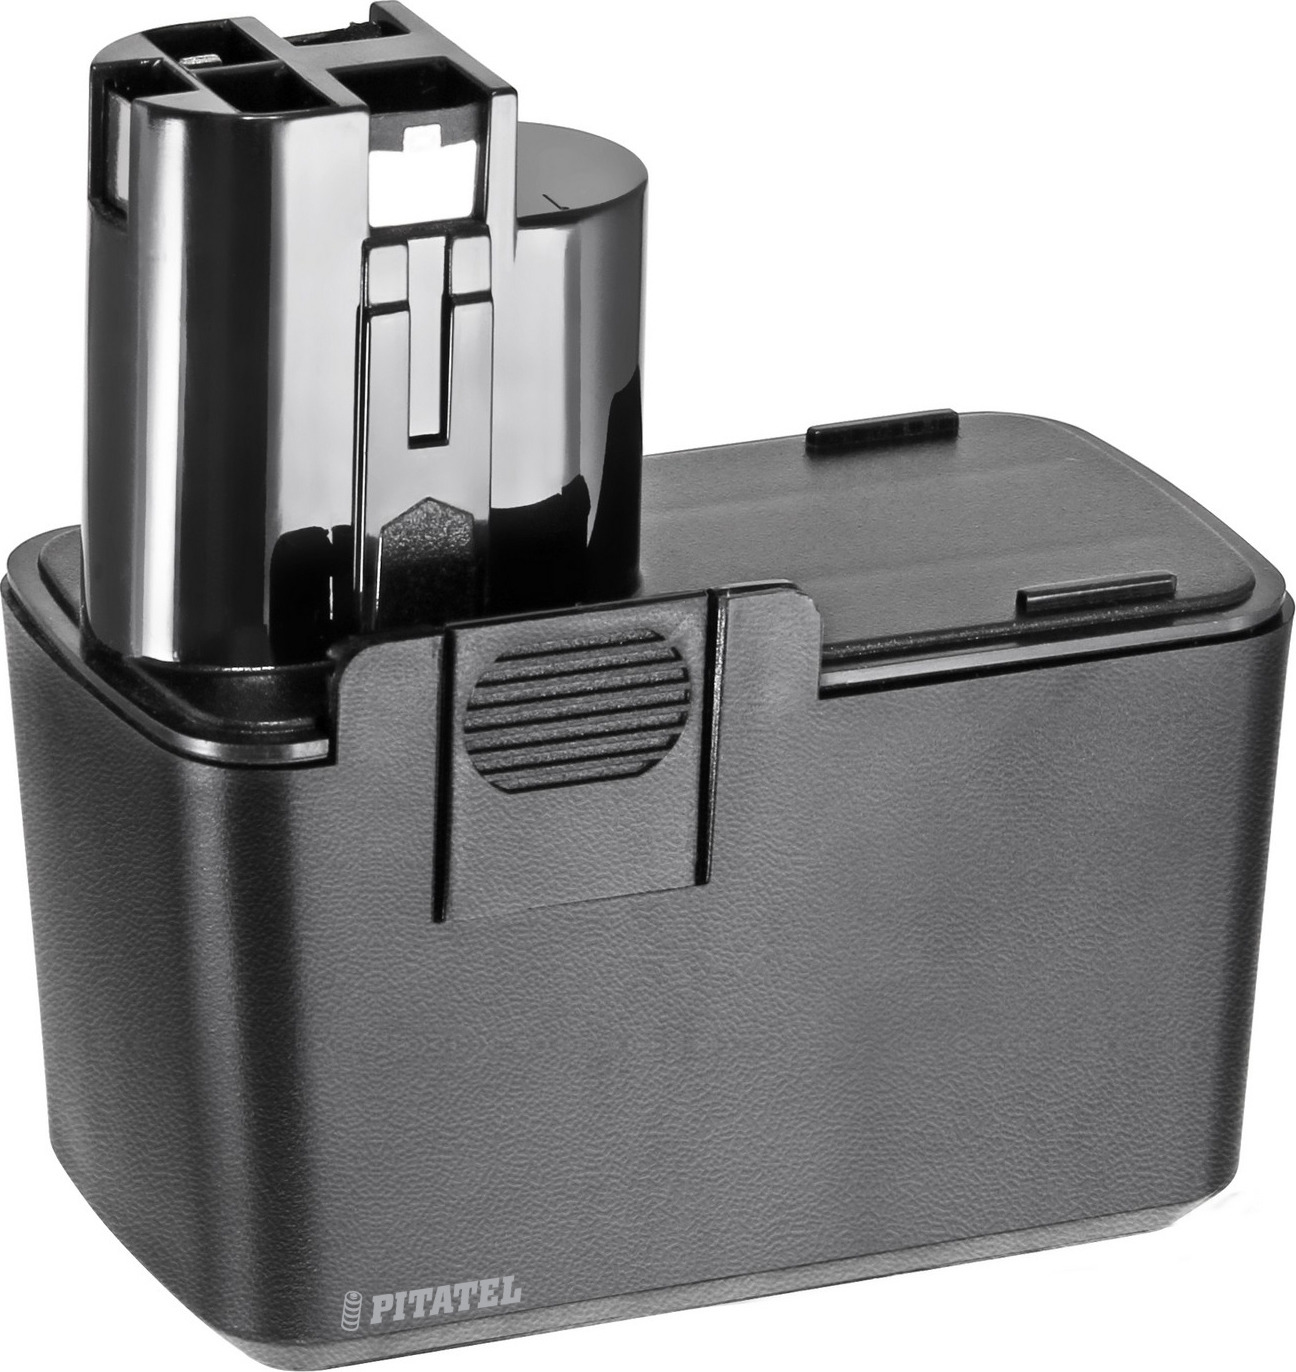 Аккумулятор для инструмента Pitatel для BOSCH. TSB-047-BOS96B-13C 607 2015